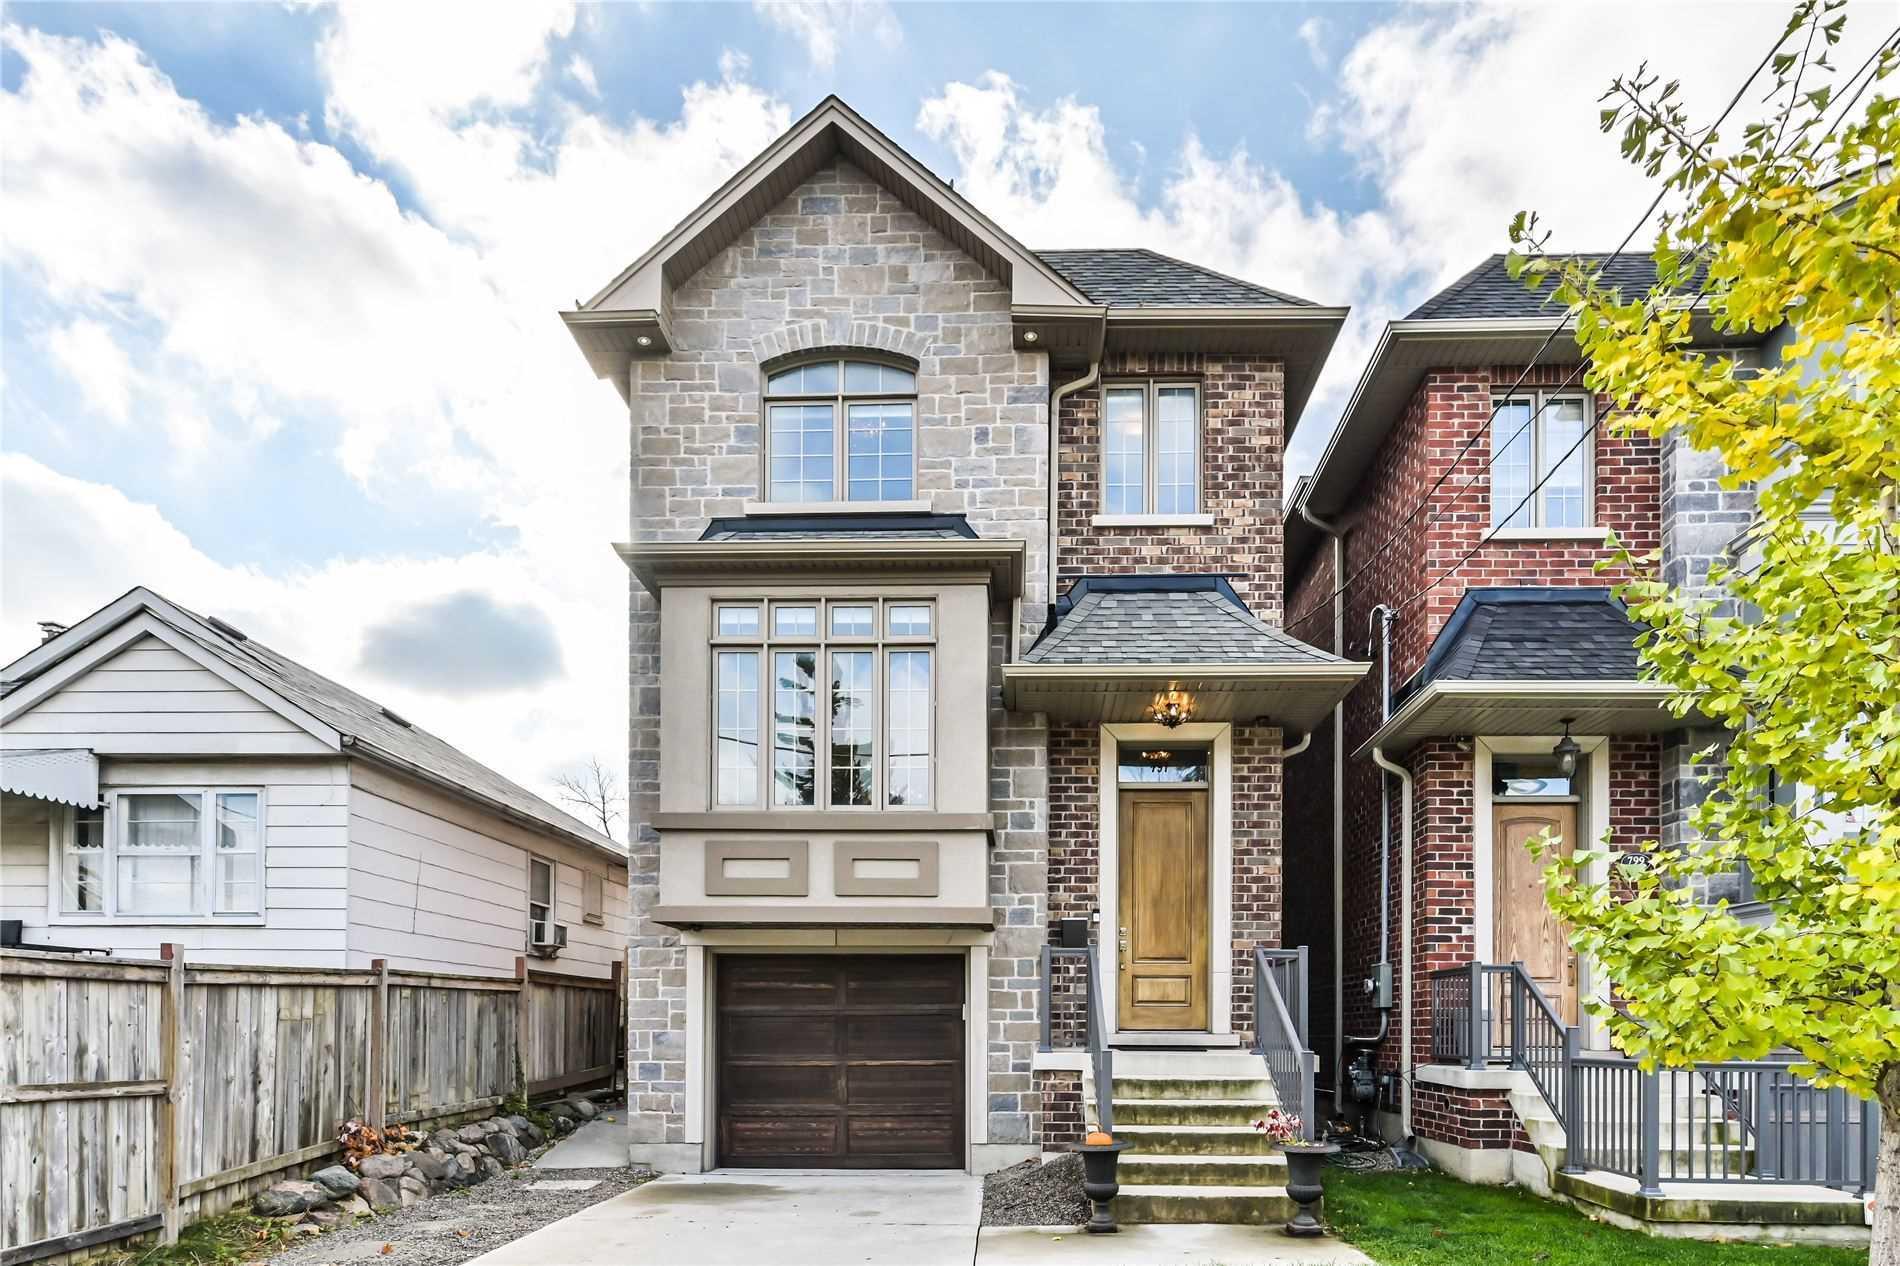 797 Glencairn Ave, Toronto, M6B2A2